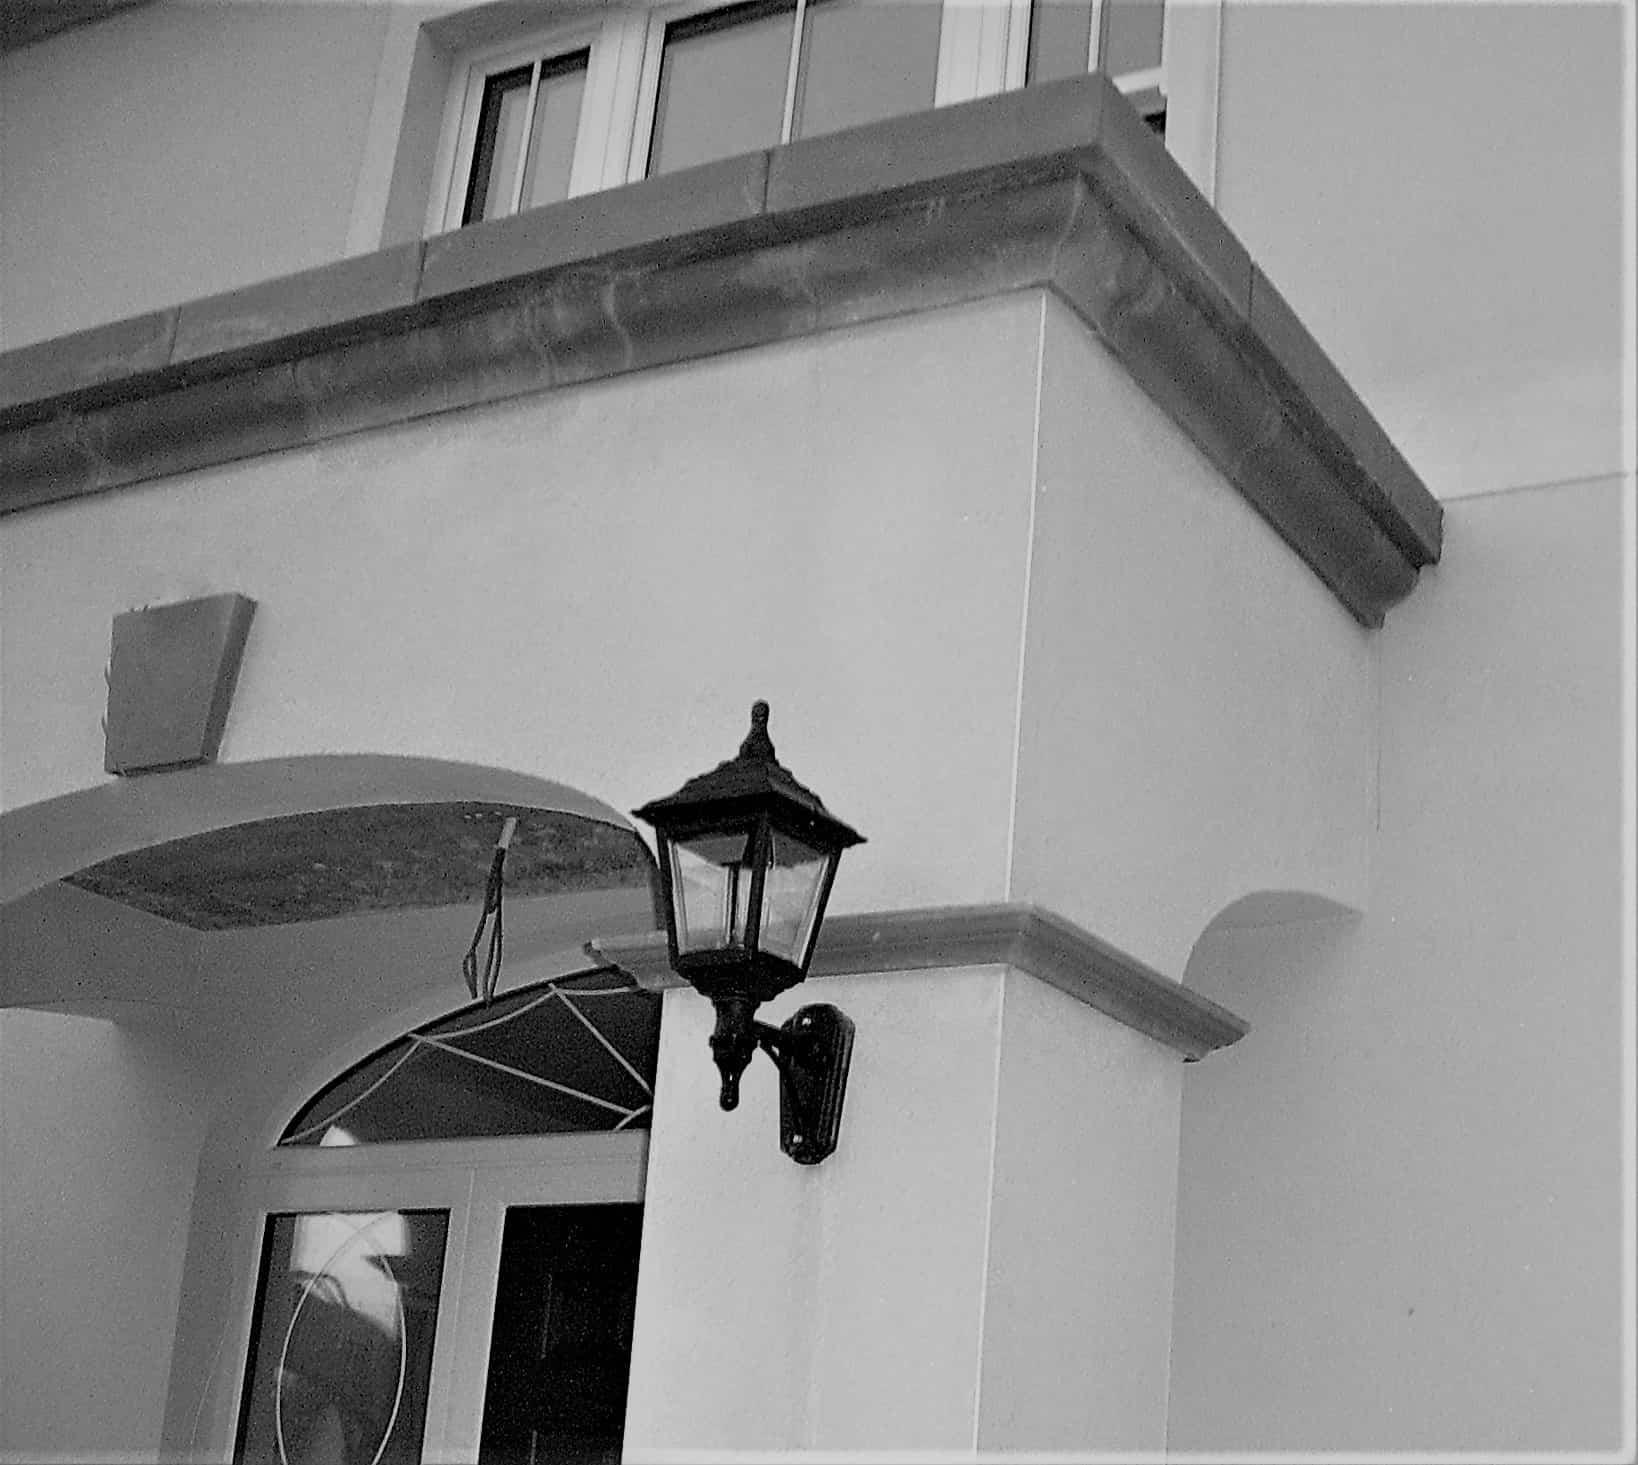 Campbell Dwelling - Porch Detail